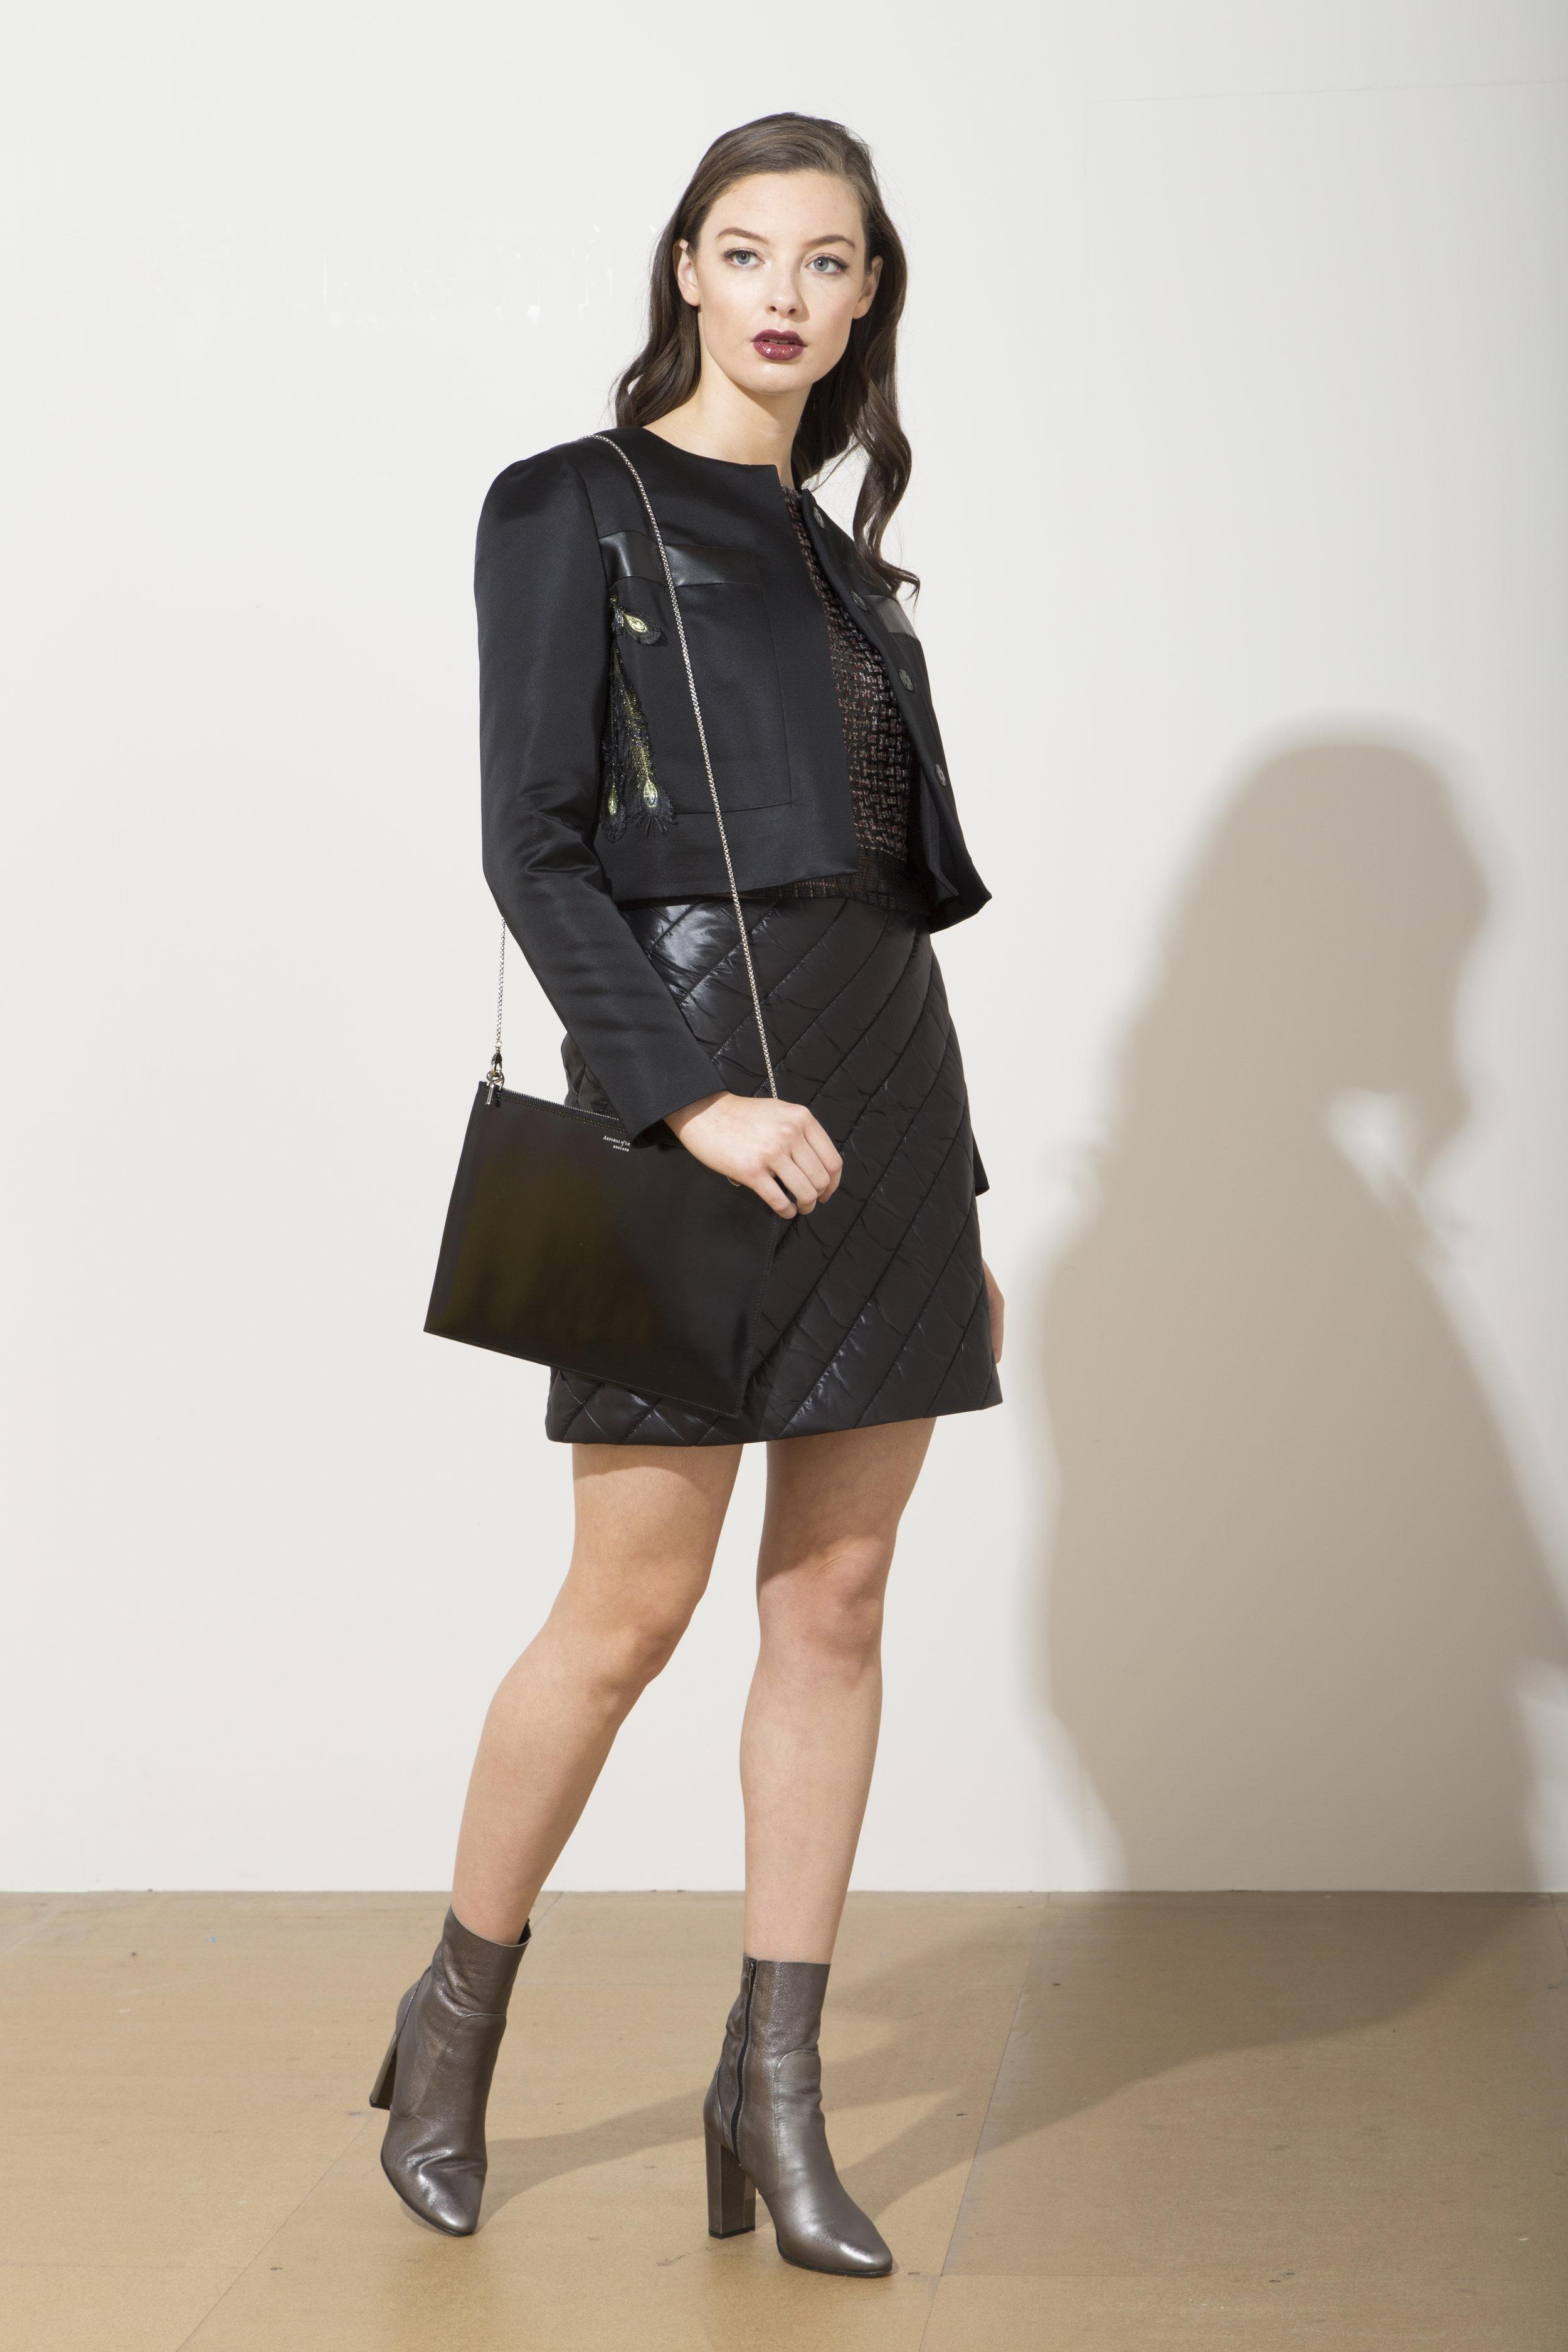 Bergman Jacket with Jiggy Skirt